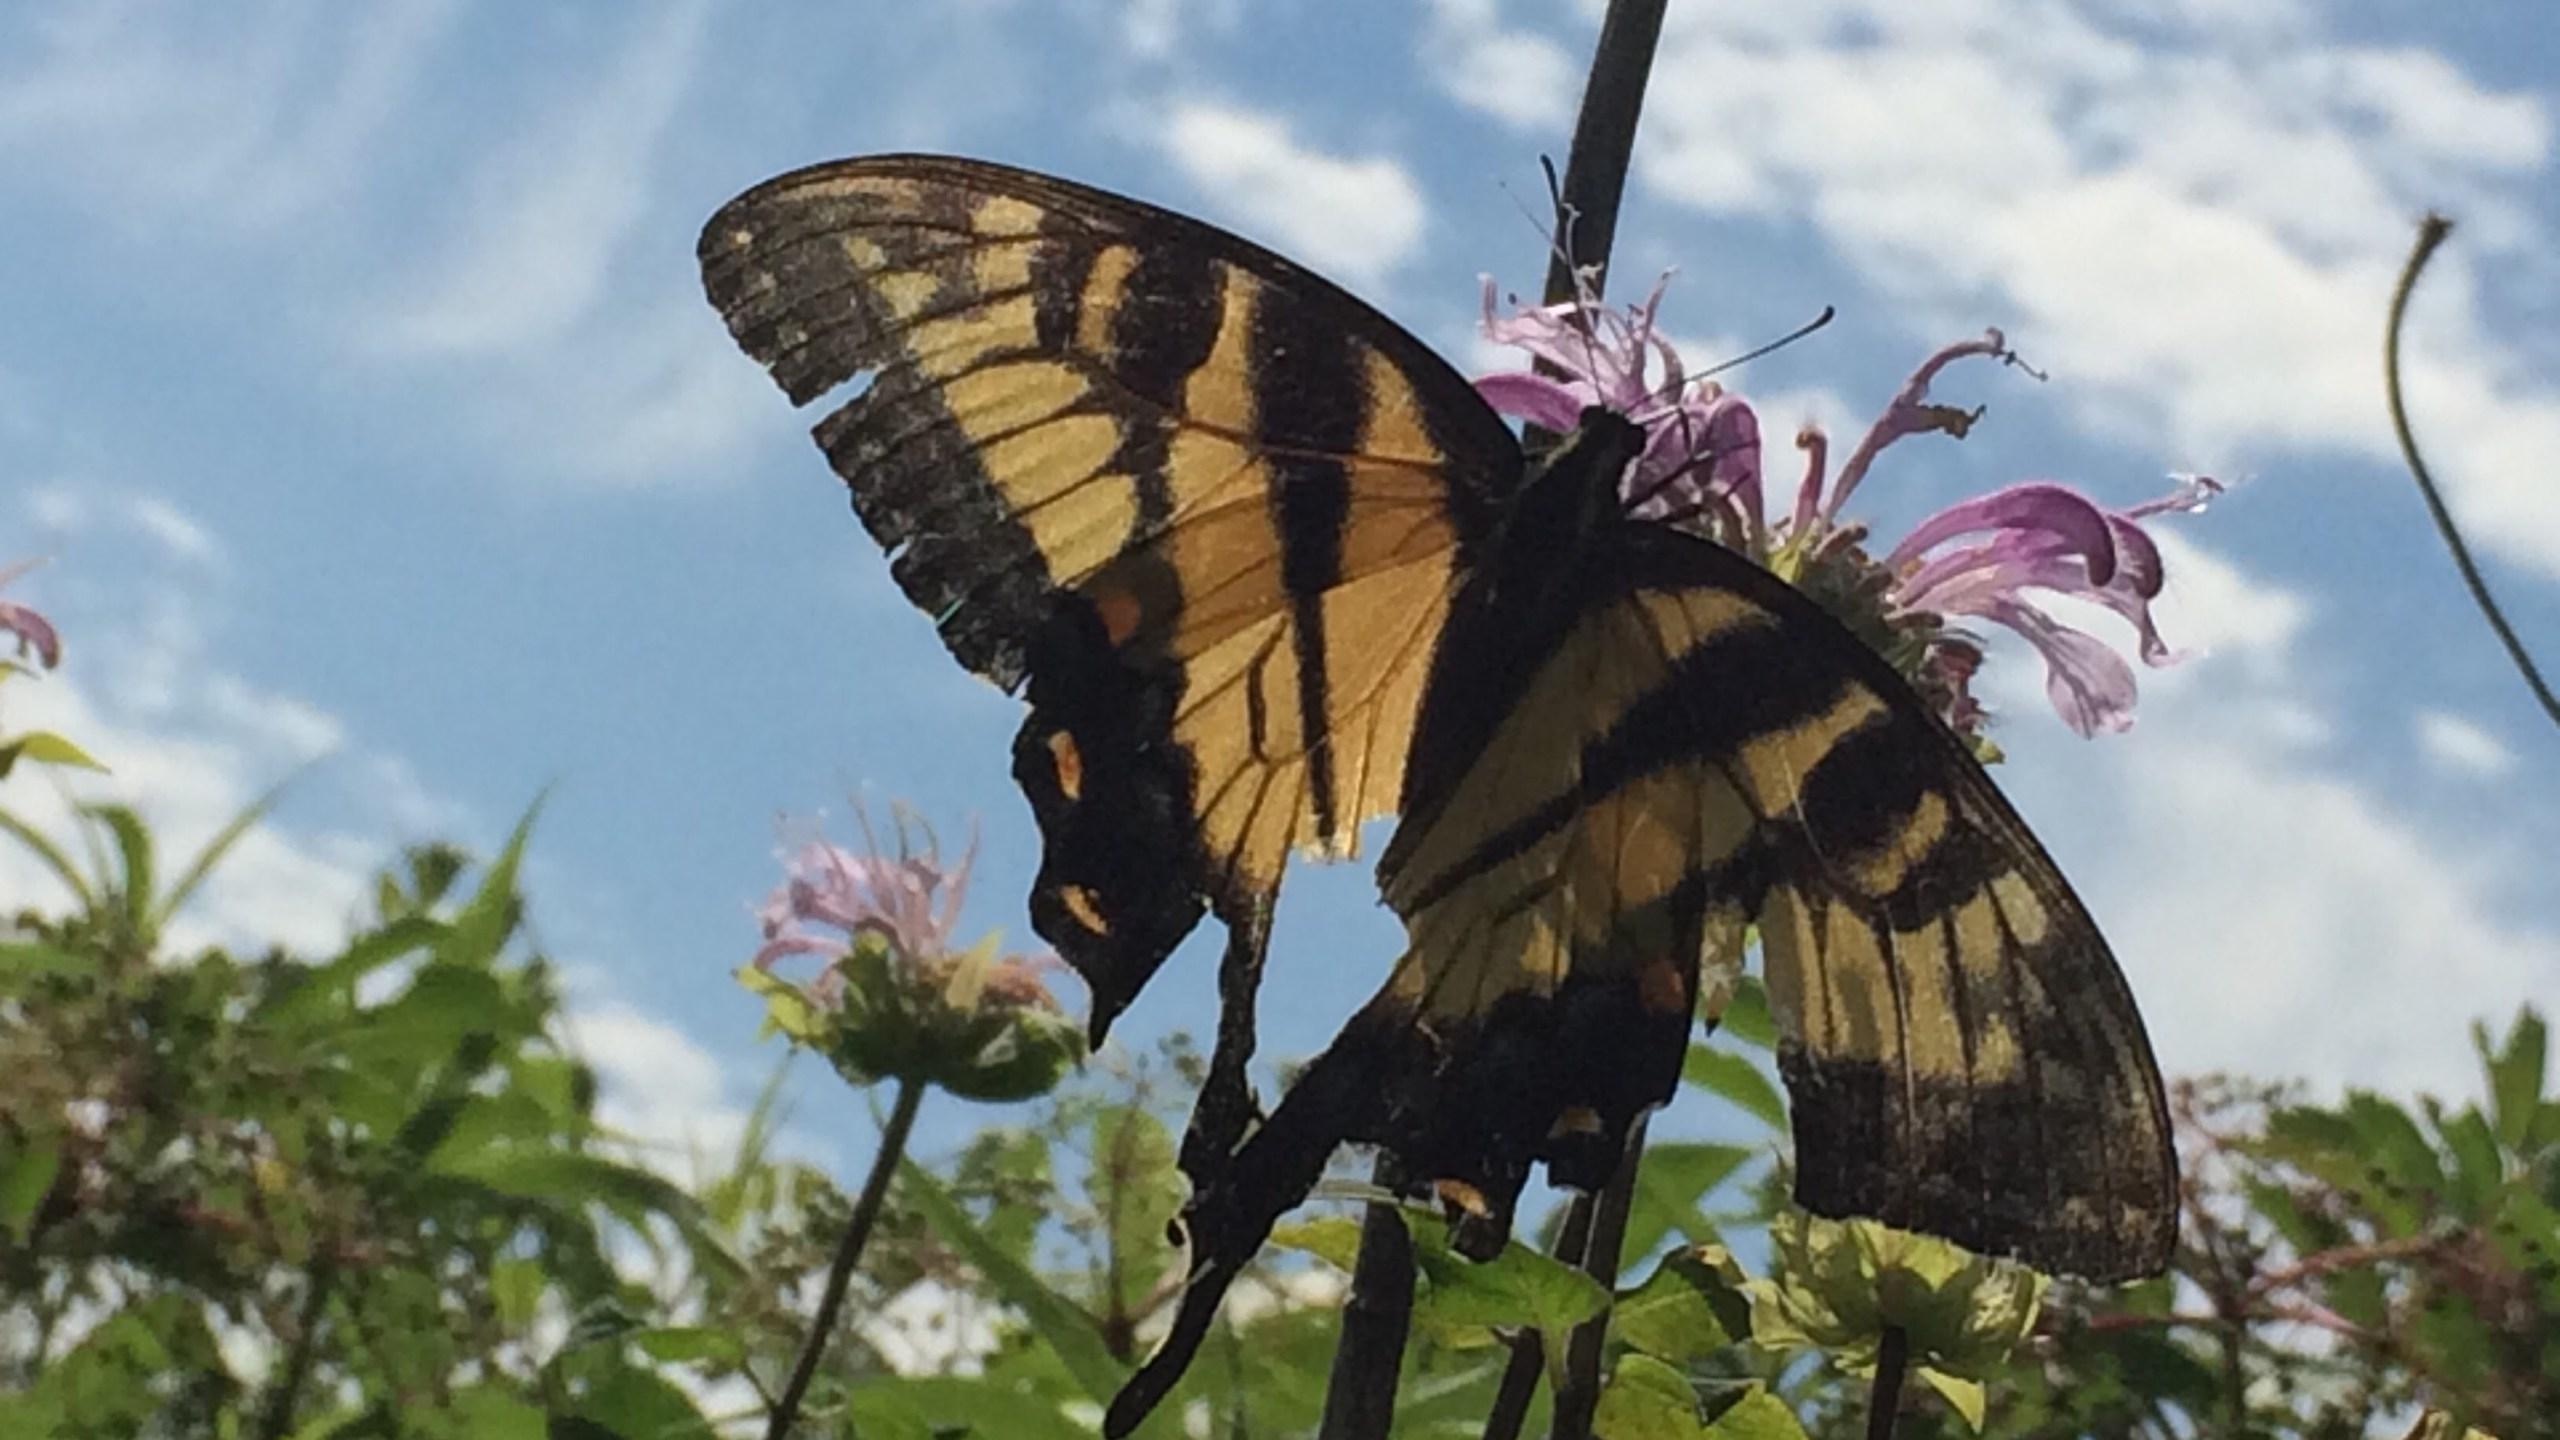 Butterfly Centerville Washington Twp_1526481015068.jpg.jpg